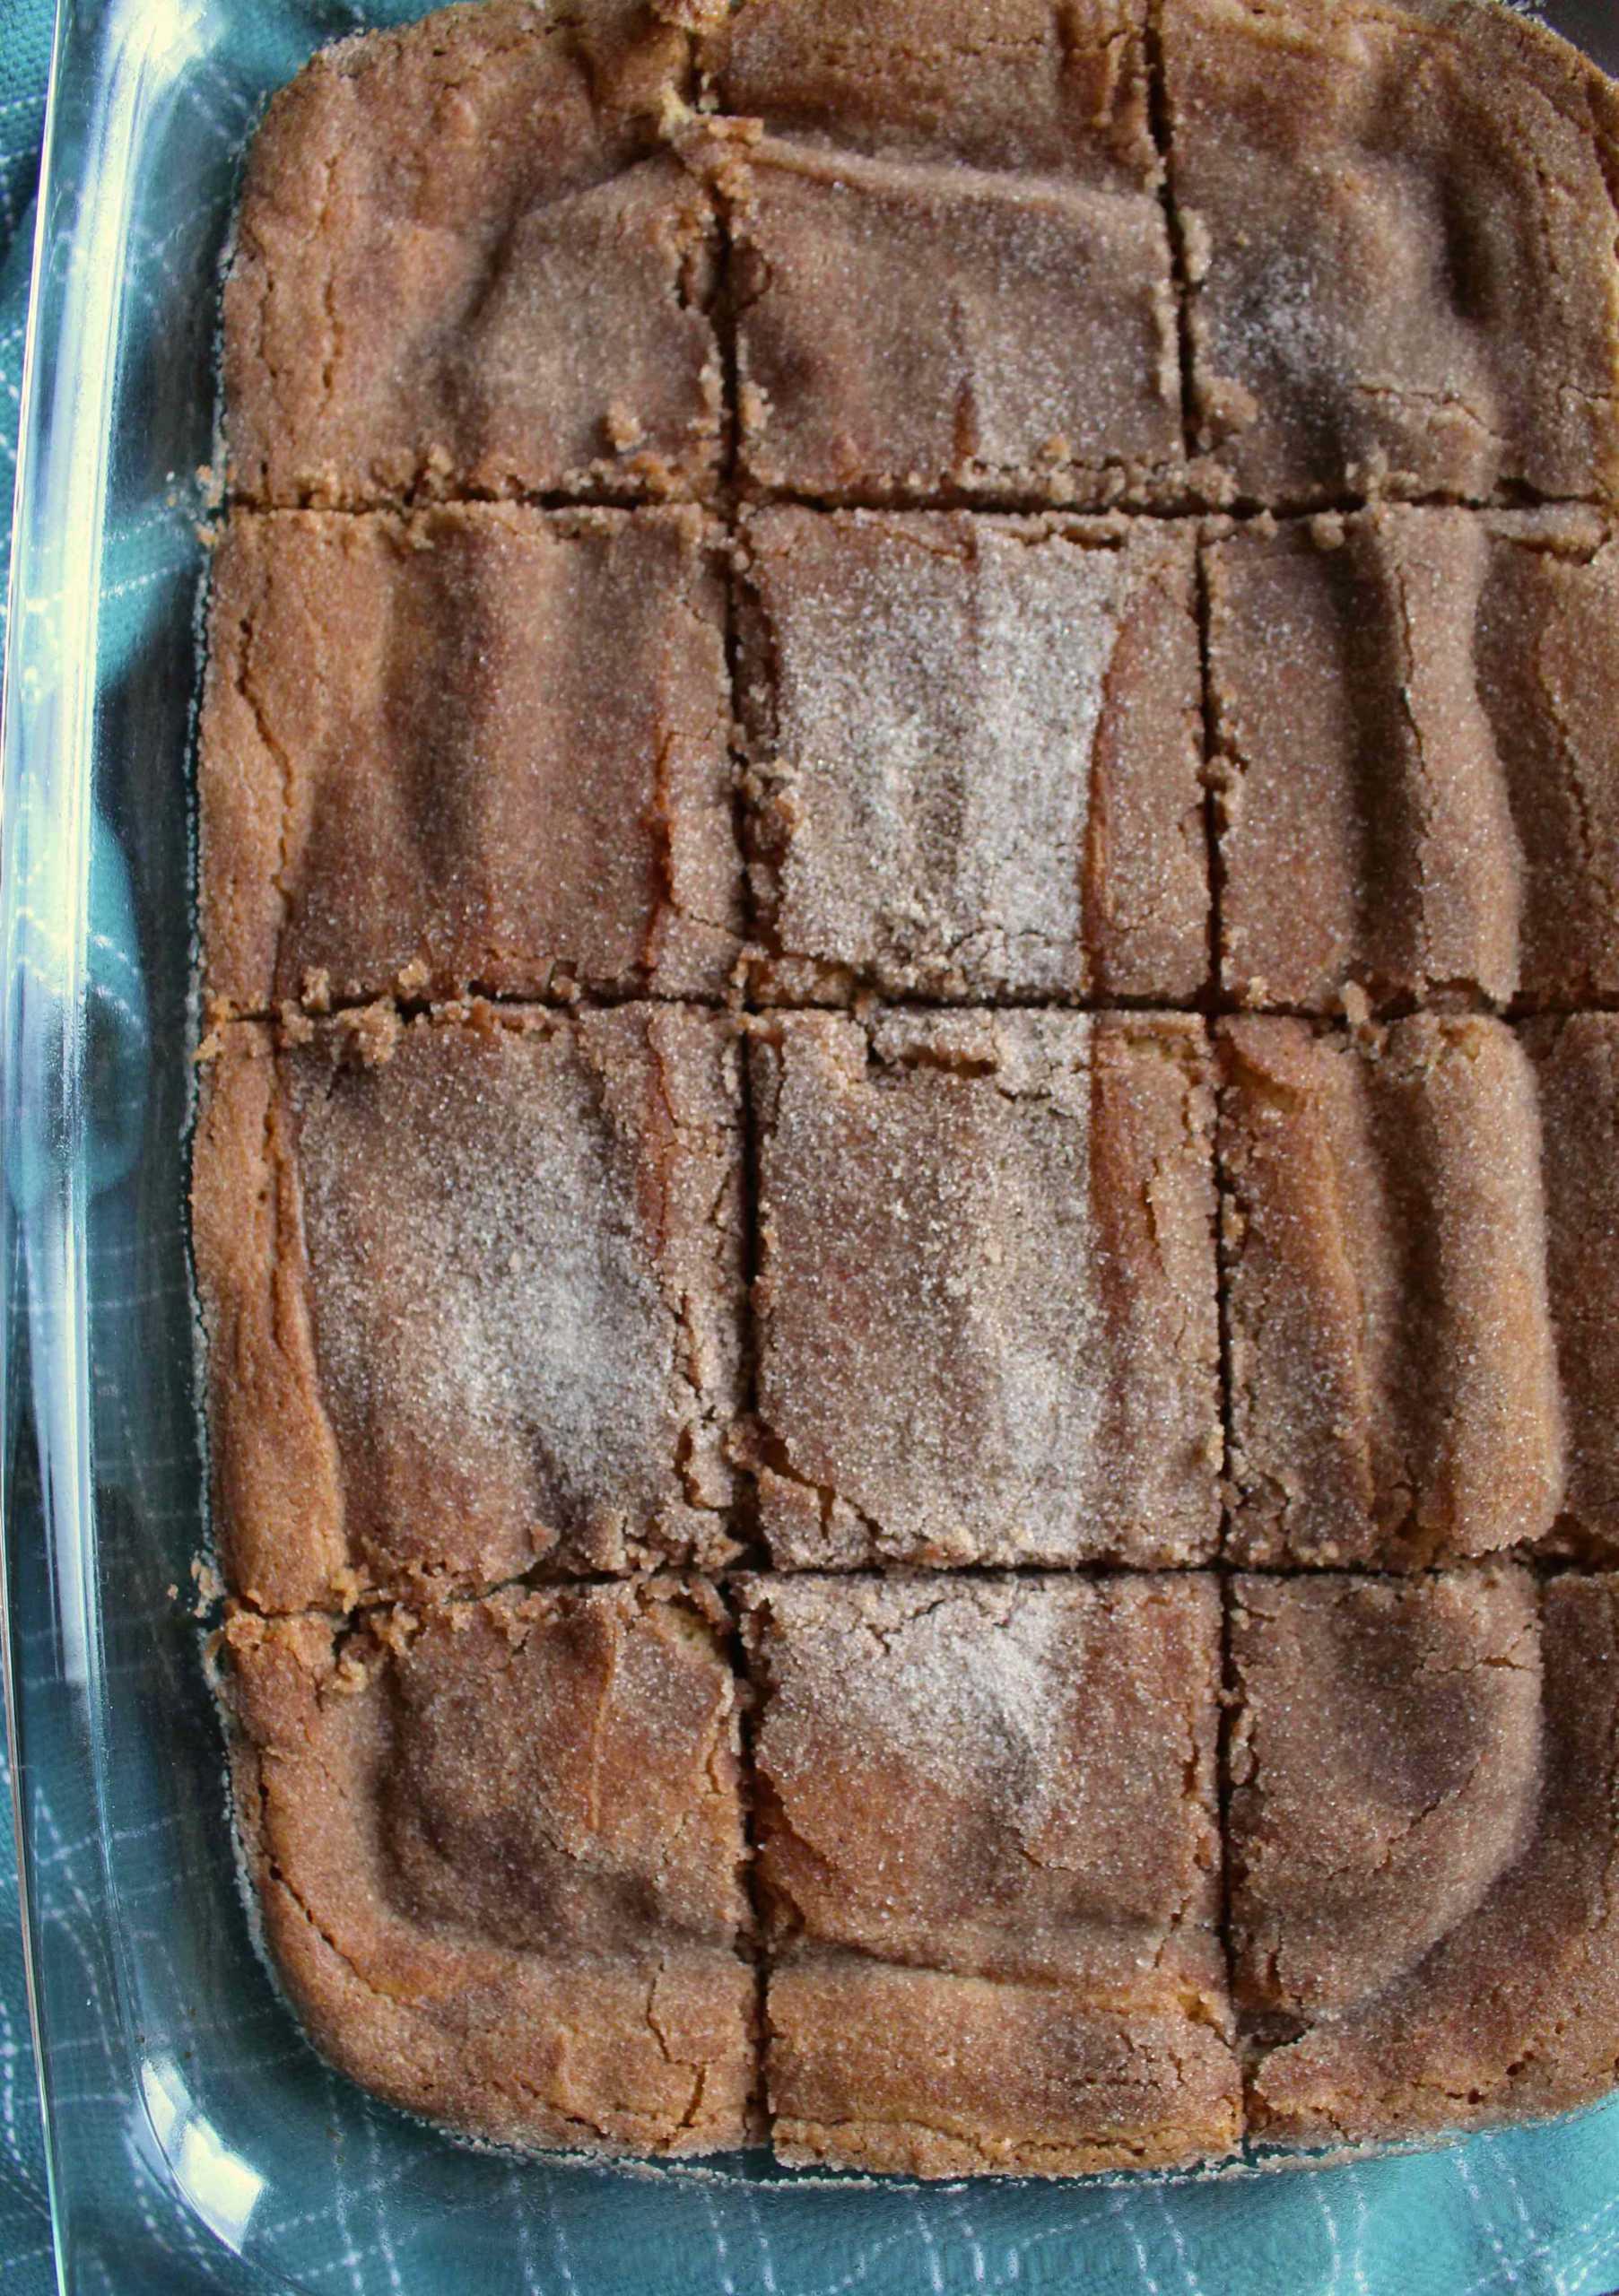 Snickerdoodle bars cut